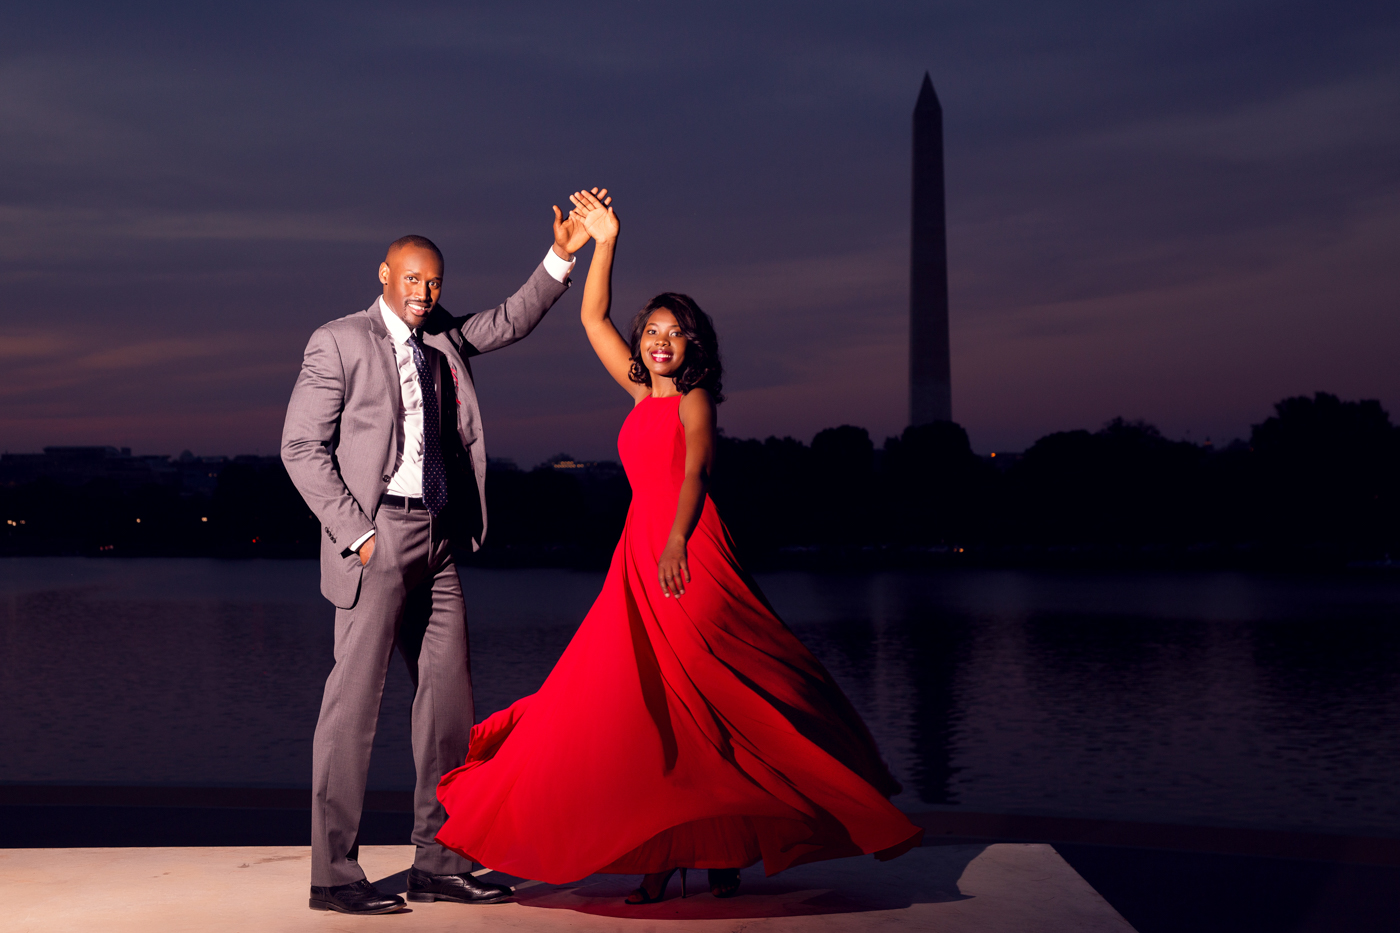 Jessica-Daniel-Engagement-Photo-Shoot-in-the-heart-of-Washington-DC-Ksenia-Pro-Photography-16